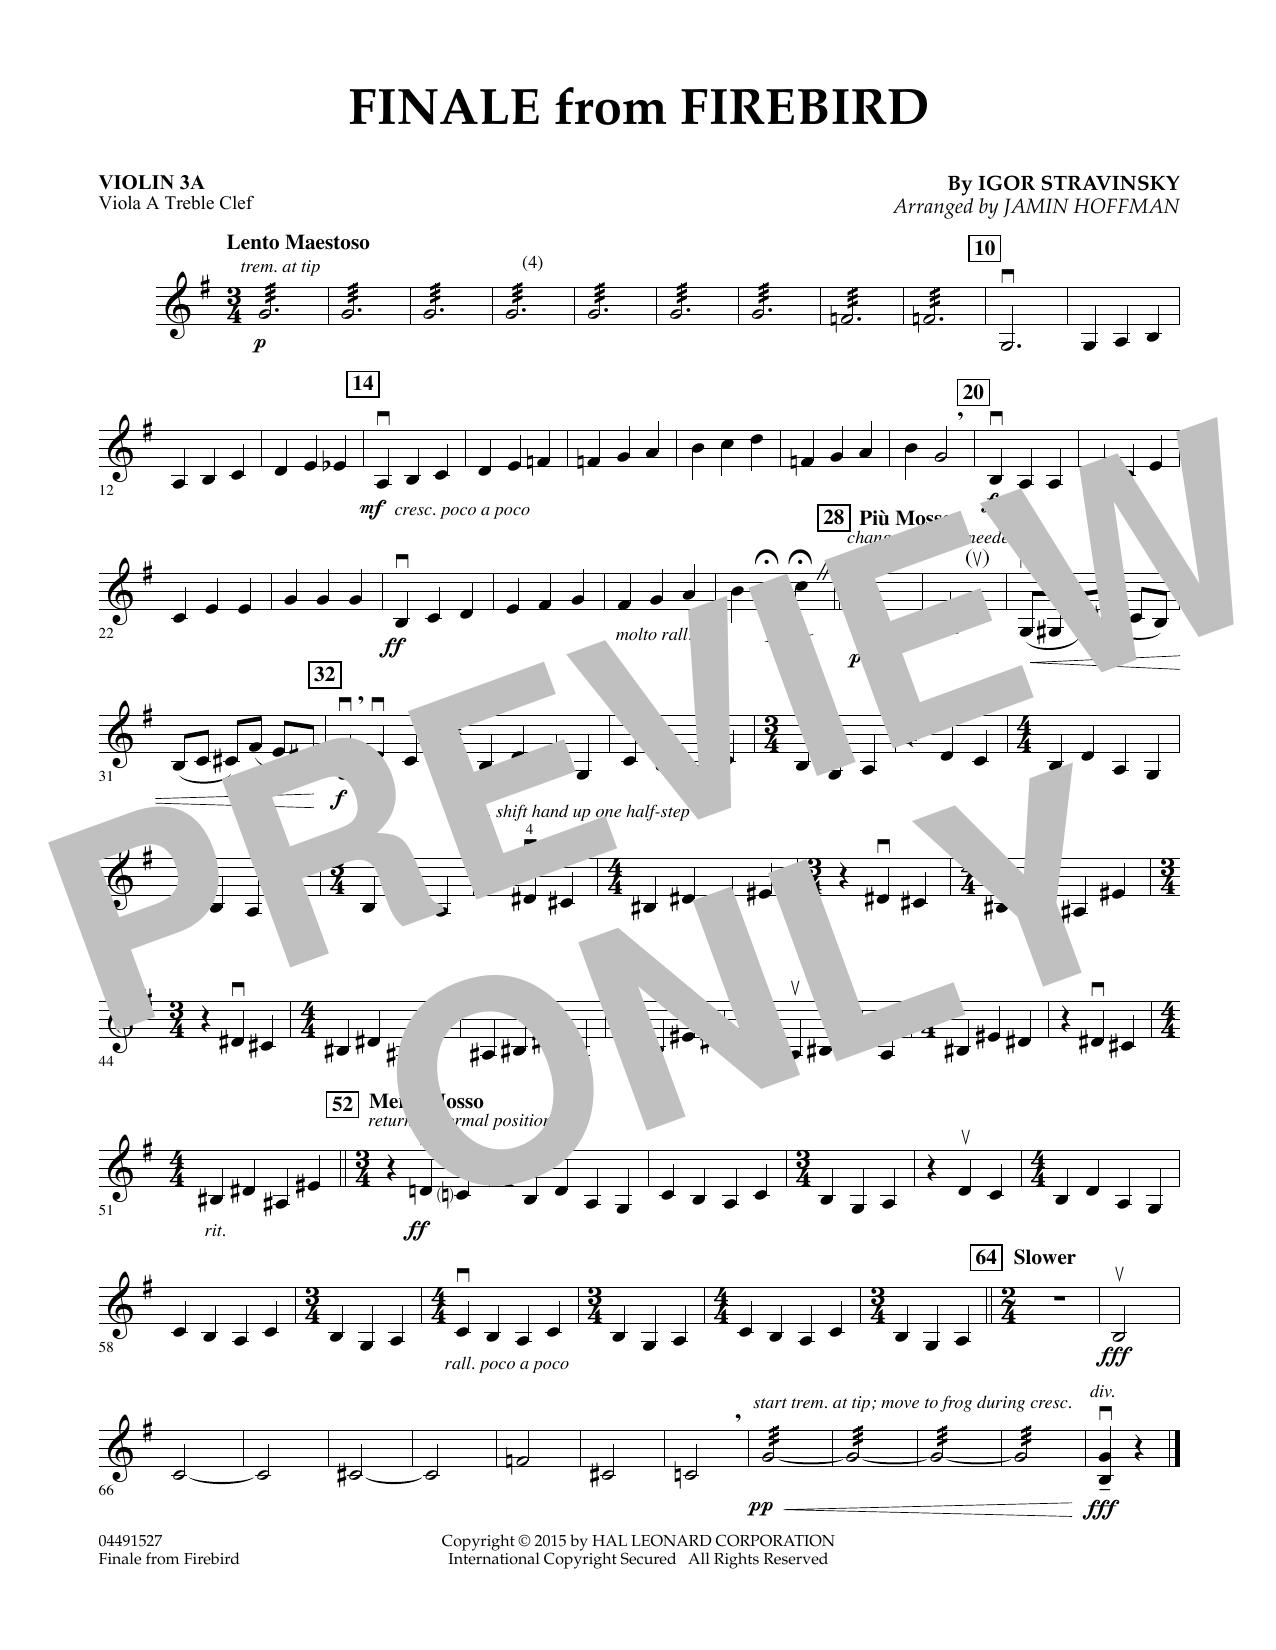 Finale from Firebird (arr. Jamin Hoffman) - Violin 3A (Orchestra)